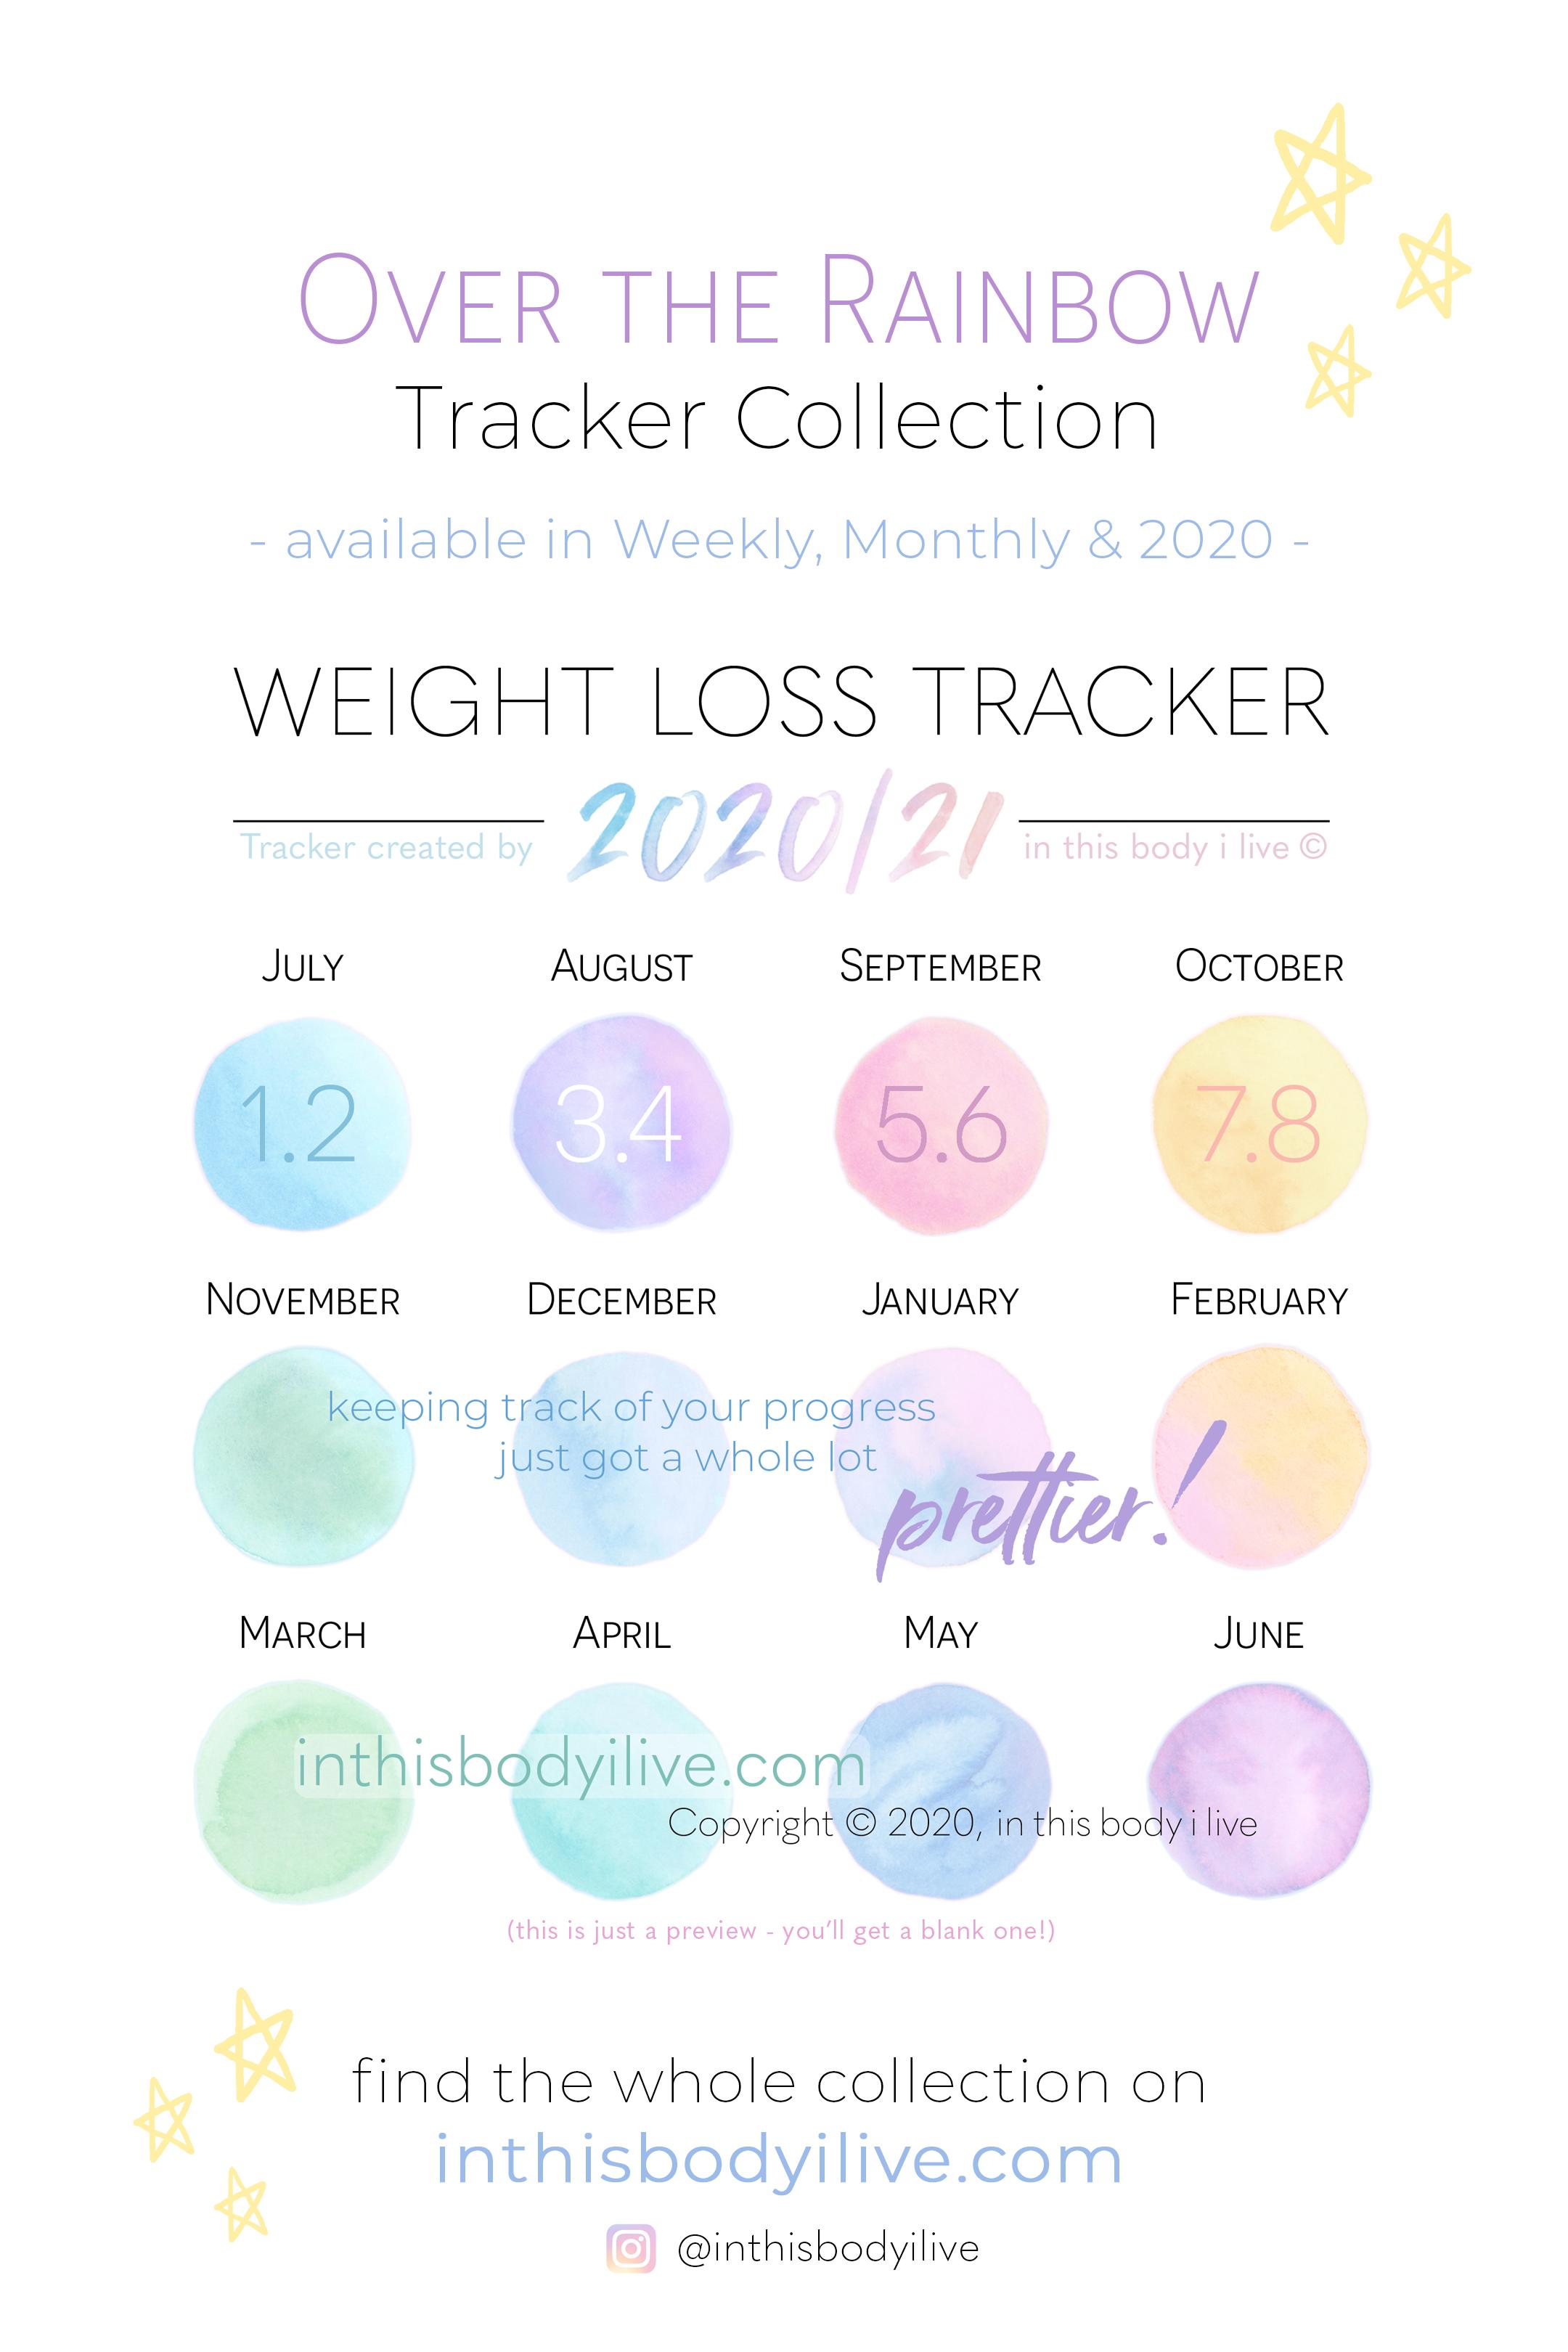 Weight Loss Calendar 2021 Pin on Weight Loss Trackers, Calendars + Templates